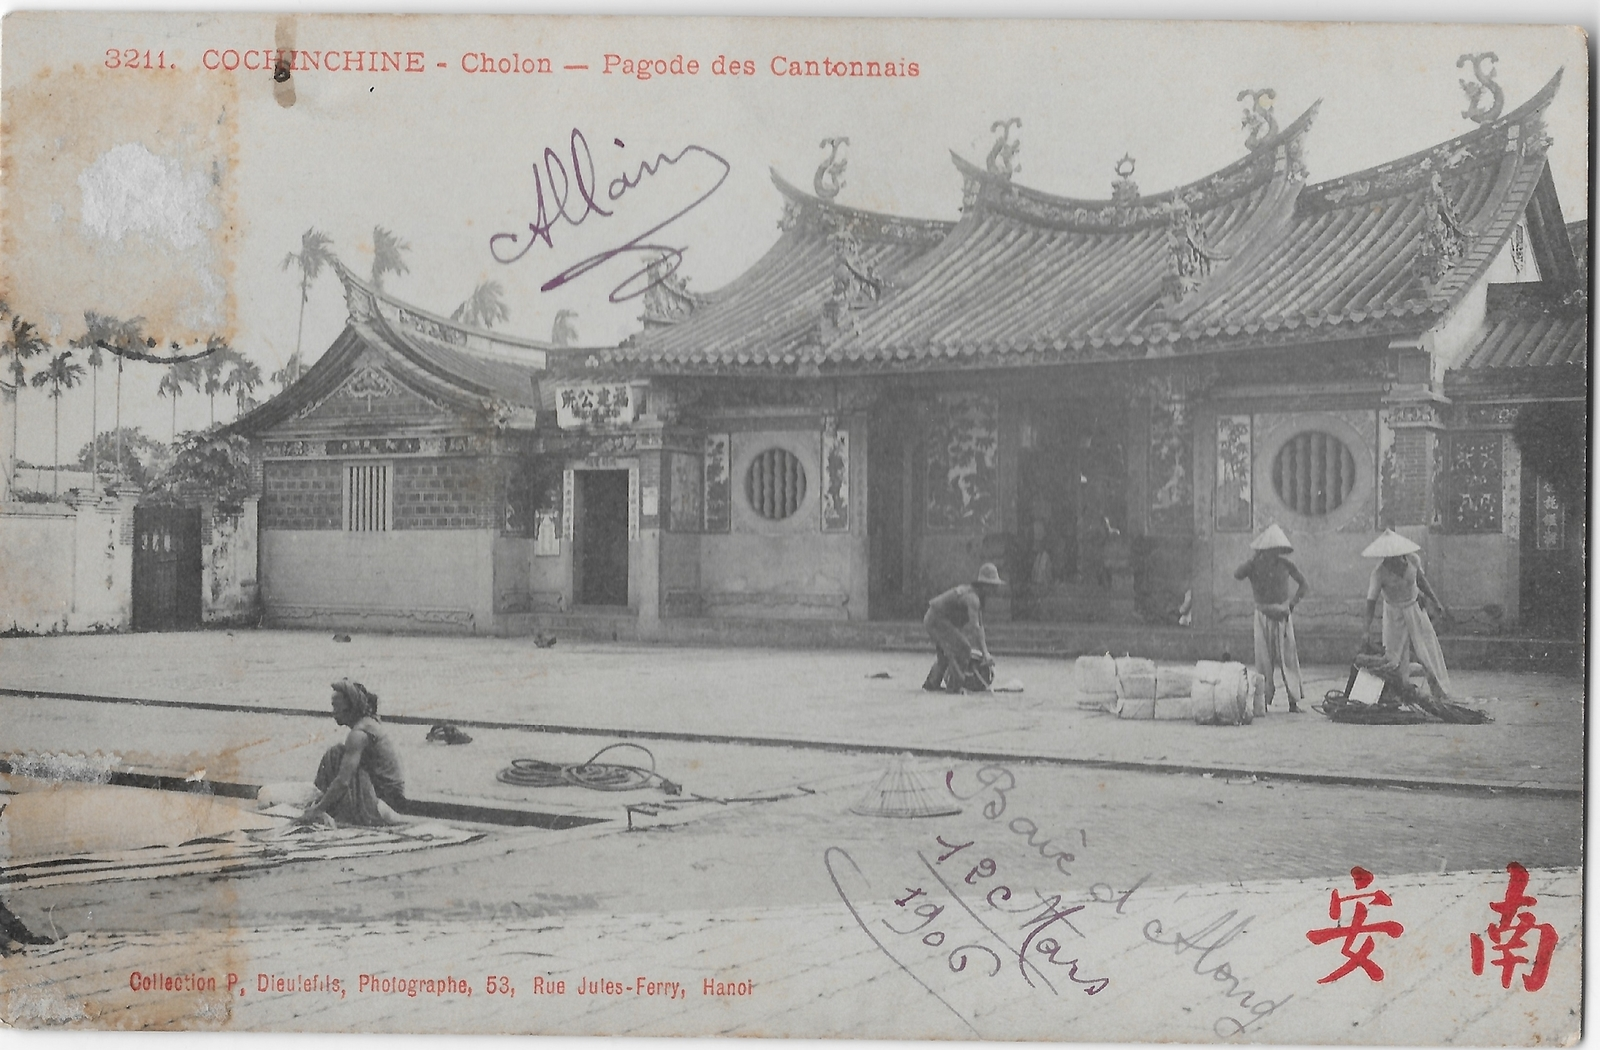 Cholon -  Pagode des cantonnais